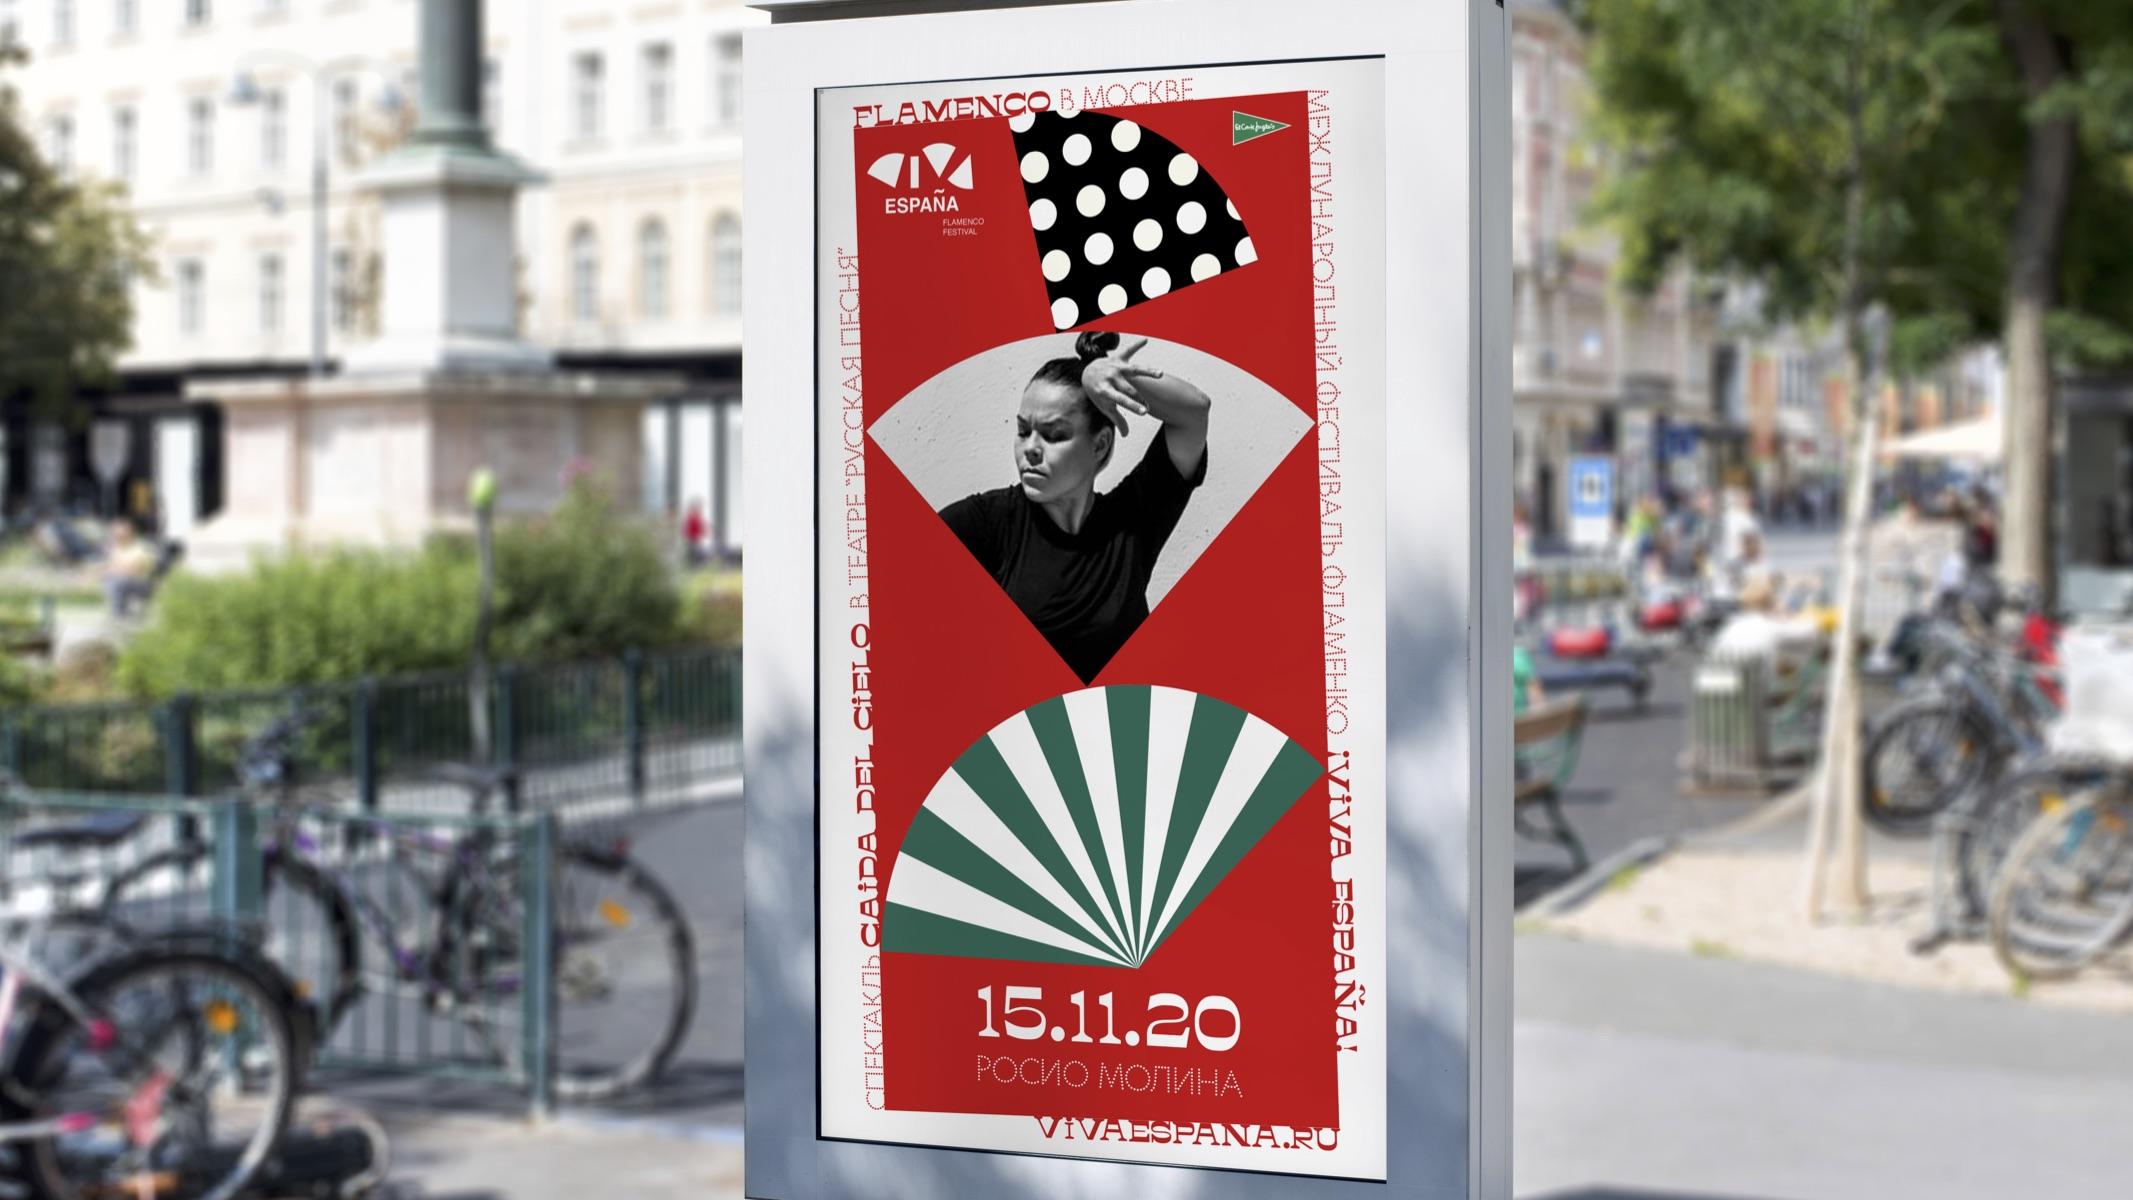 Brand Identity For ¡VIVA ESPAÑA! Flamenco Festival